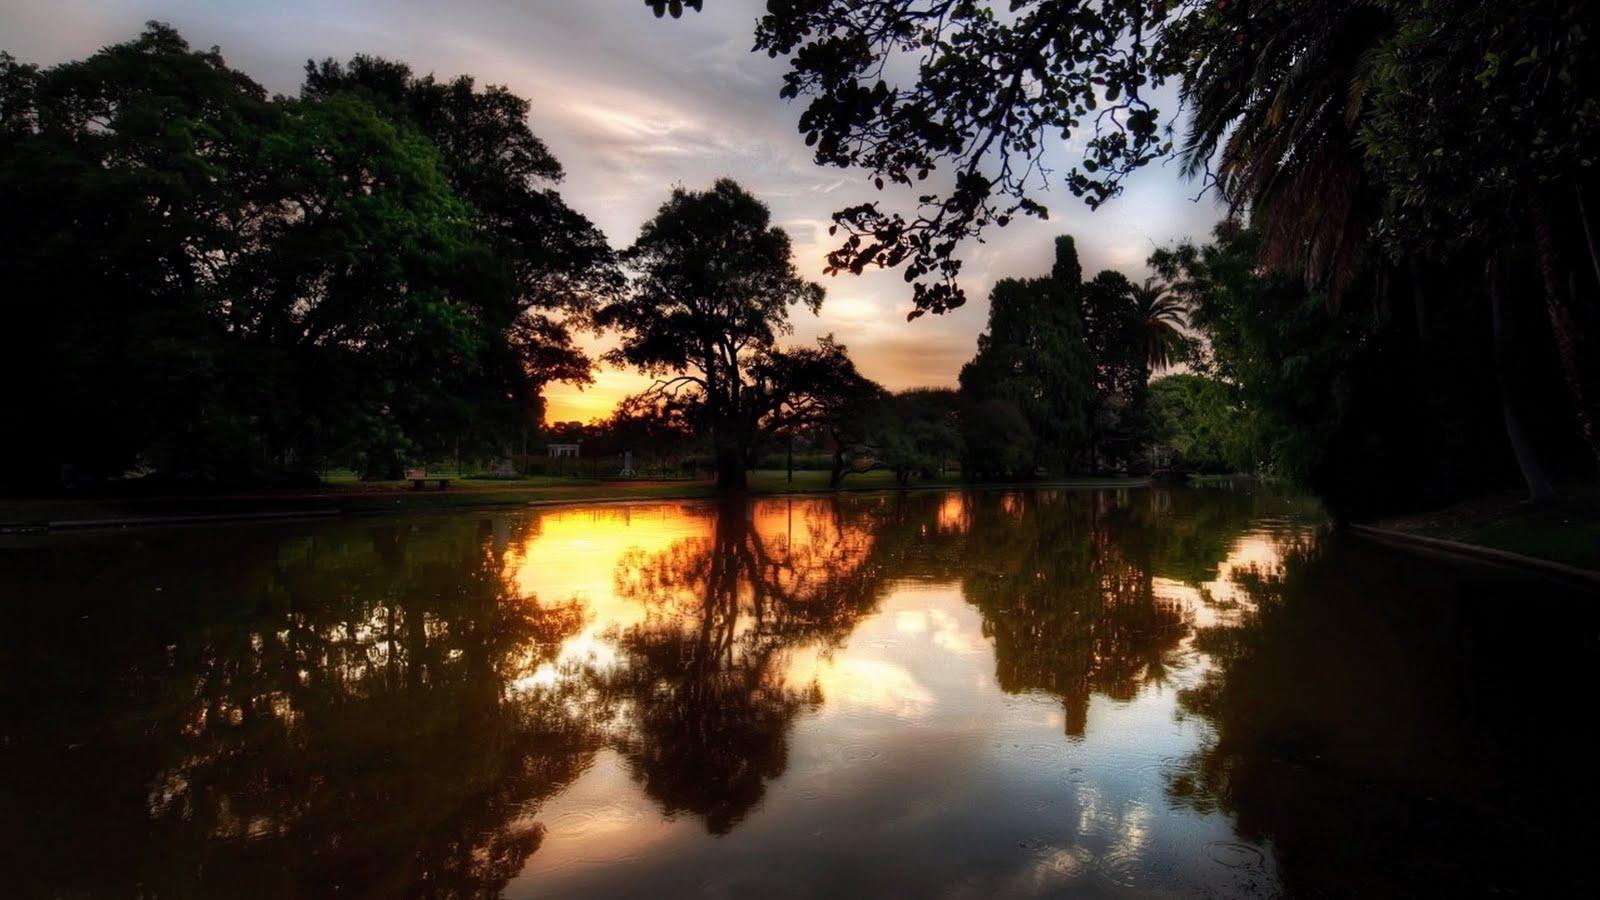 Best Wallpaper: 20 Amazing Nature Full HD Wallpapers 1080p